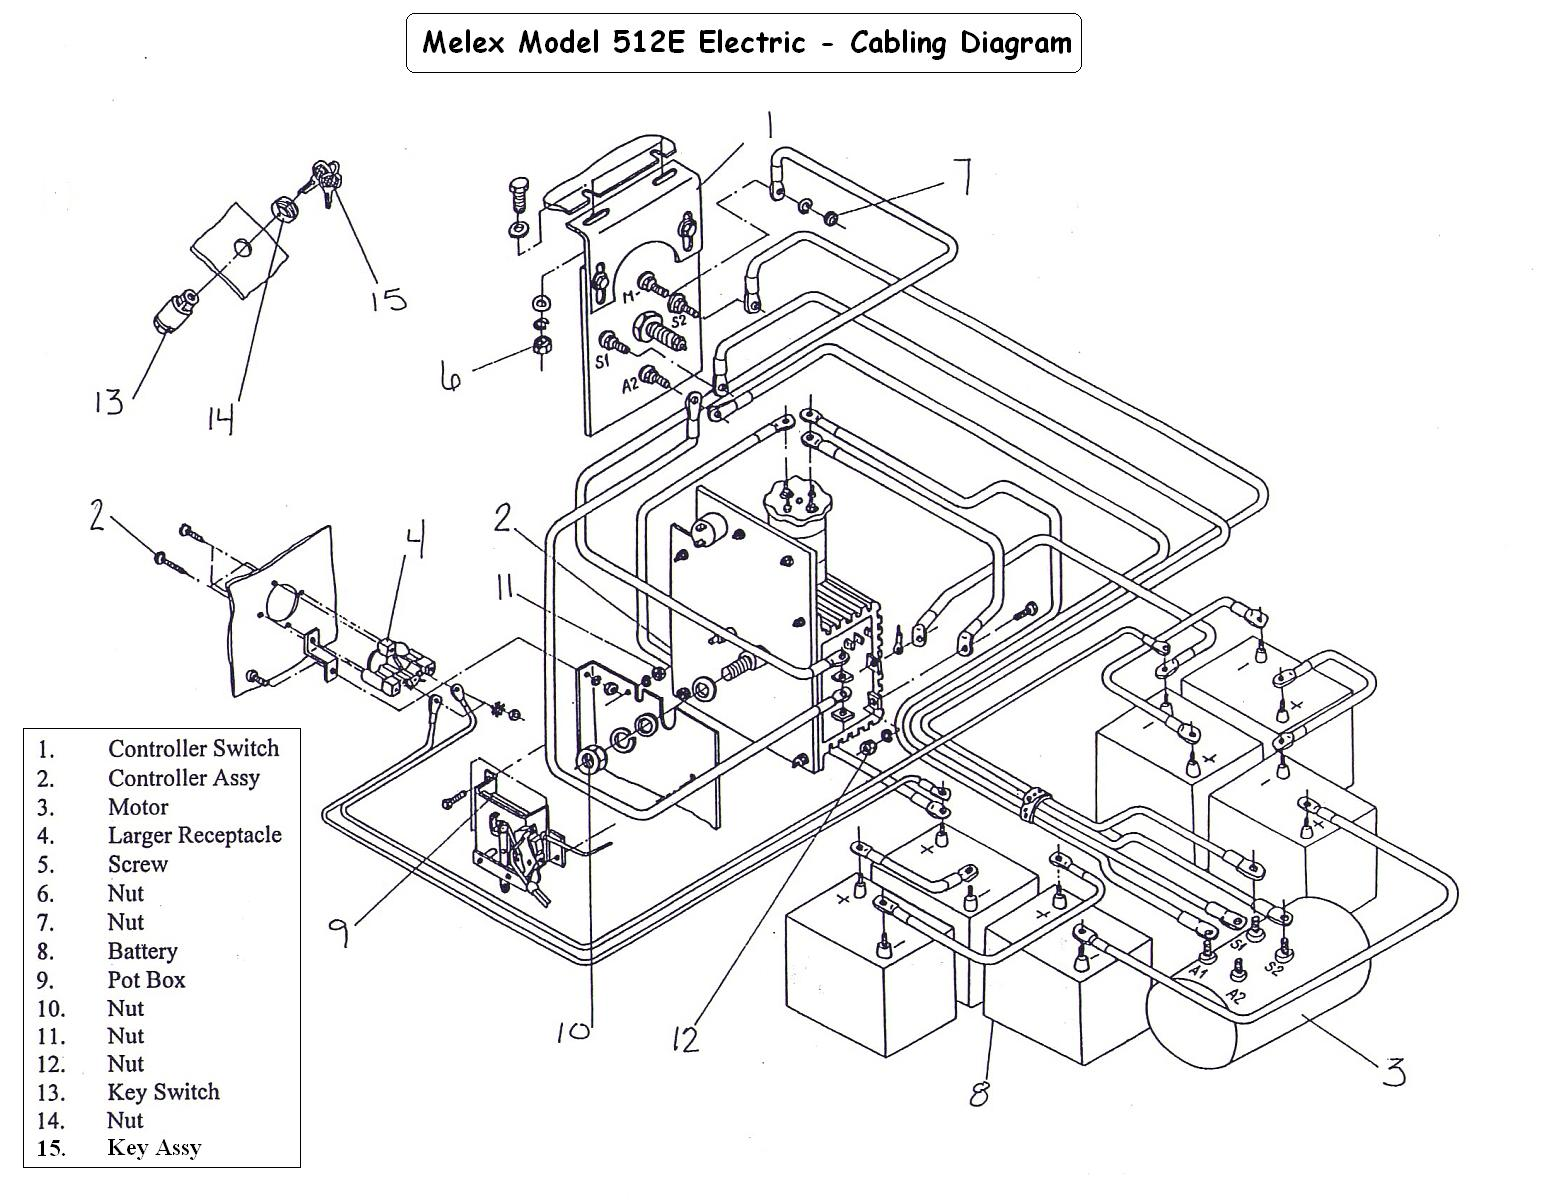 Melex512E_cabling_diagram?resize=665%2C512 yamaha wiring diagrams readingrat net yamaha g9 gas golf cart wiring diagram at nearapp.co